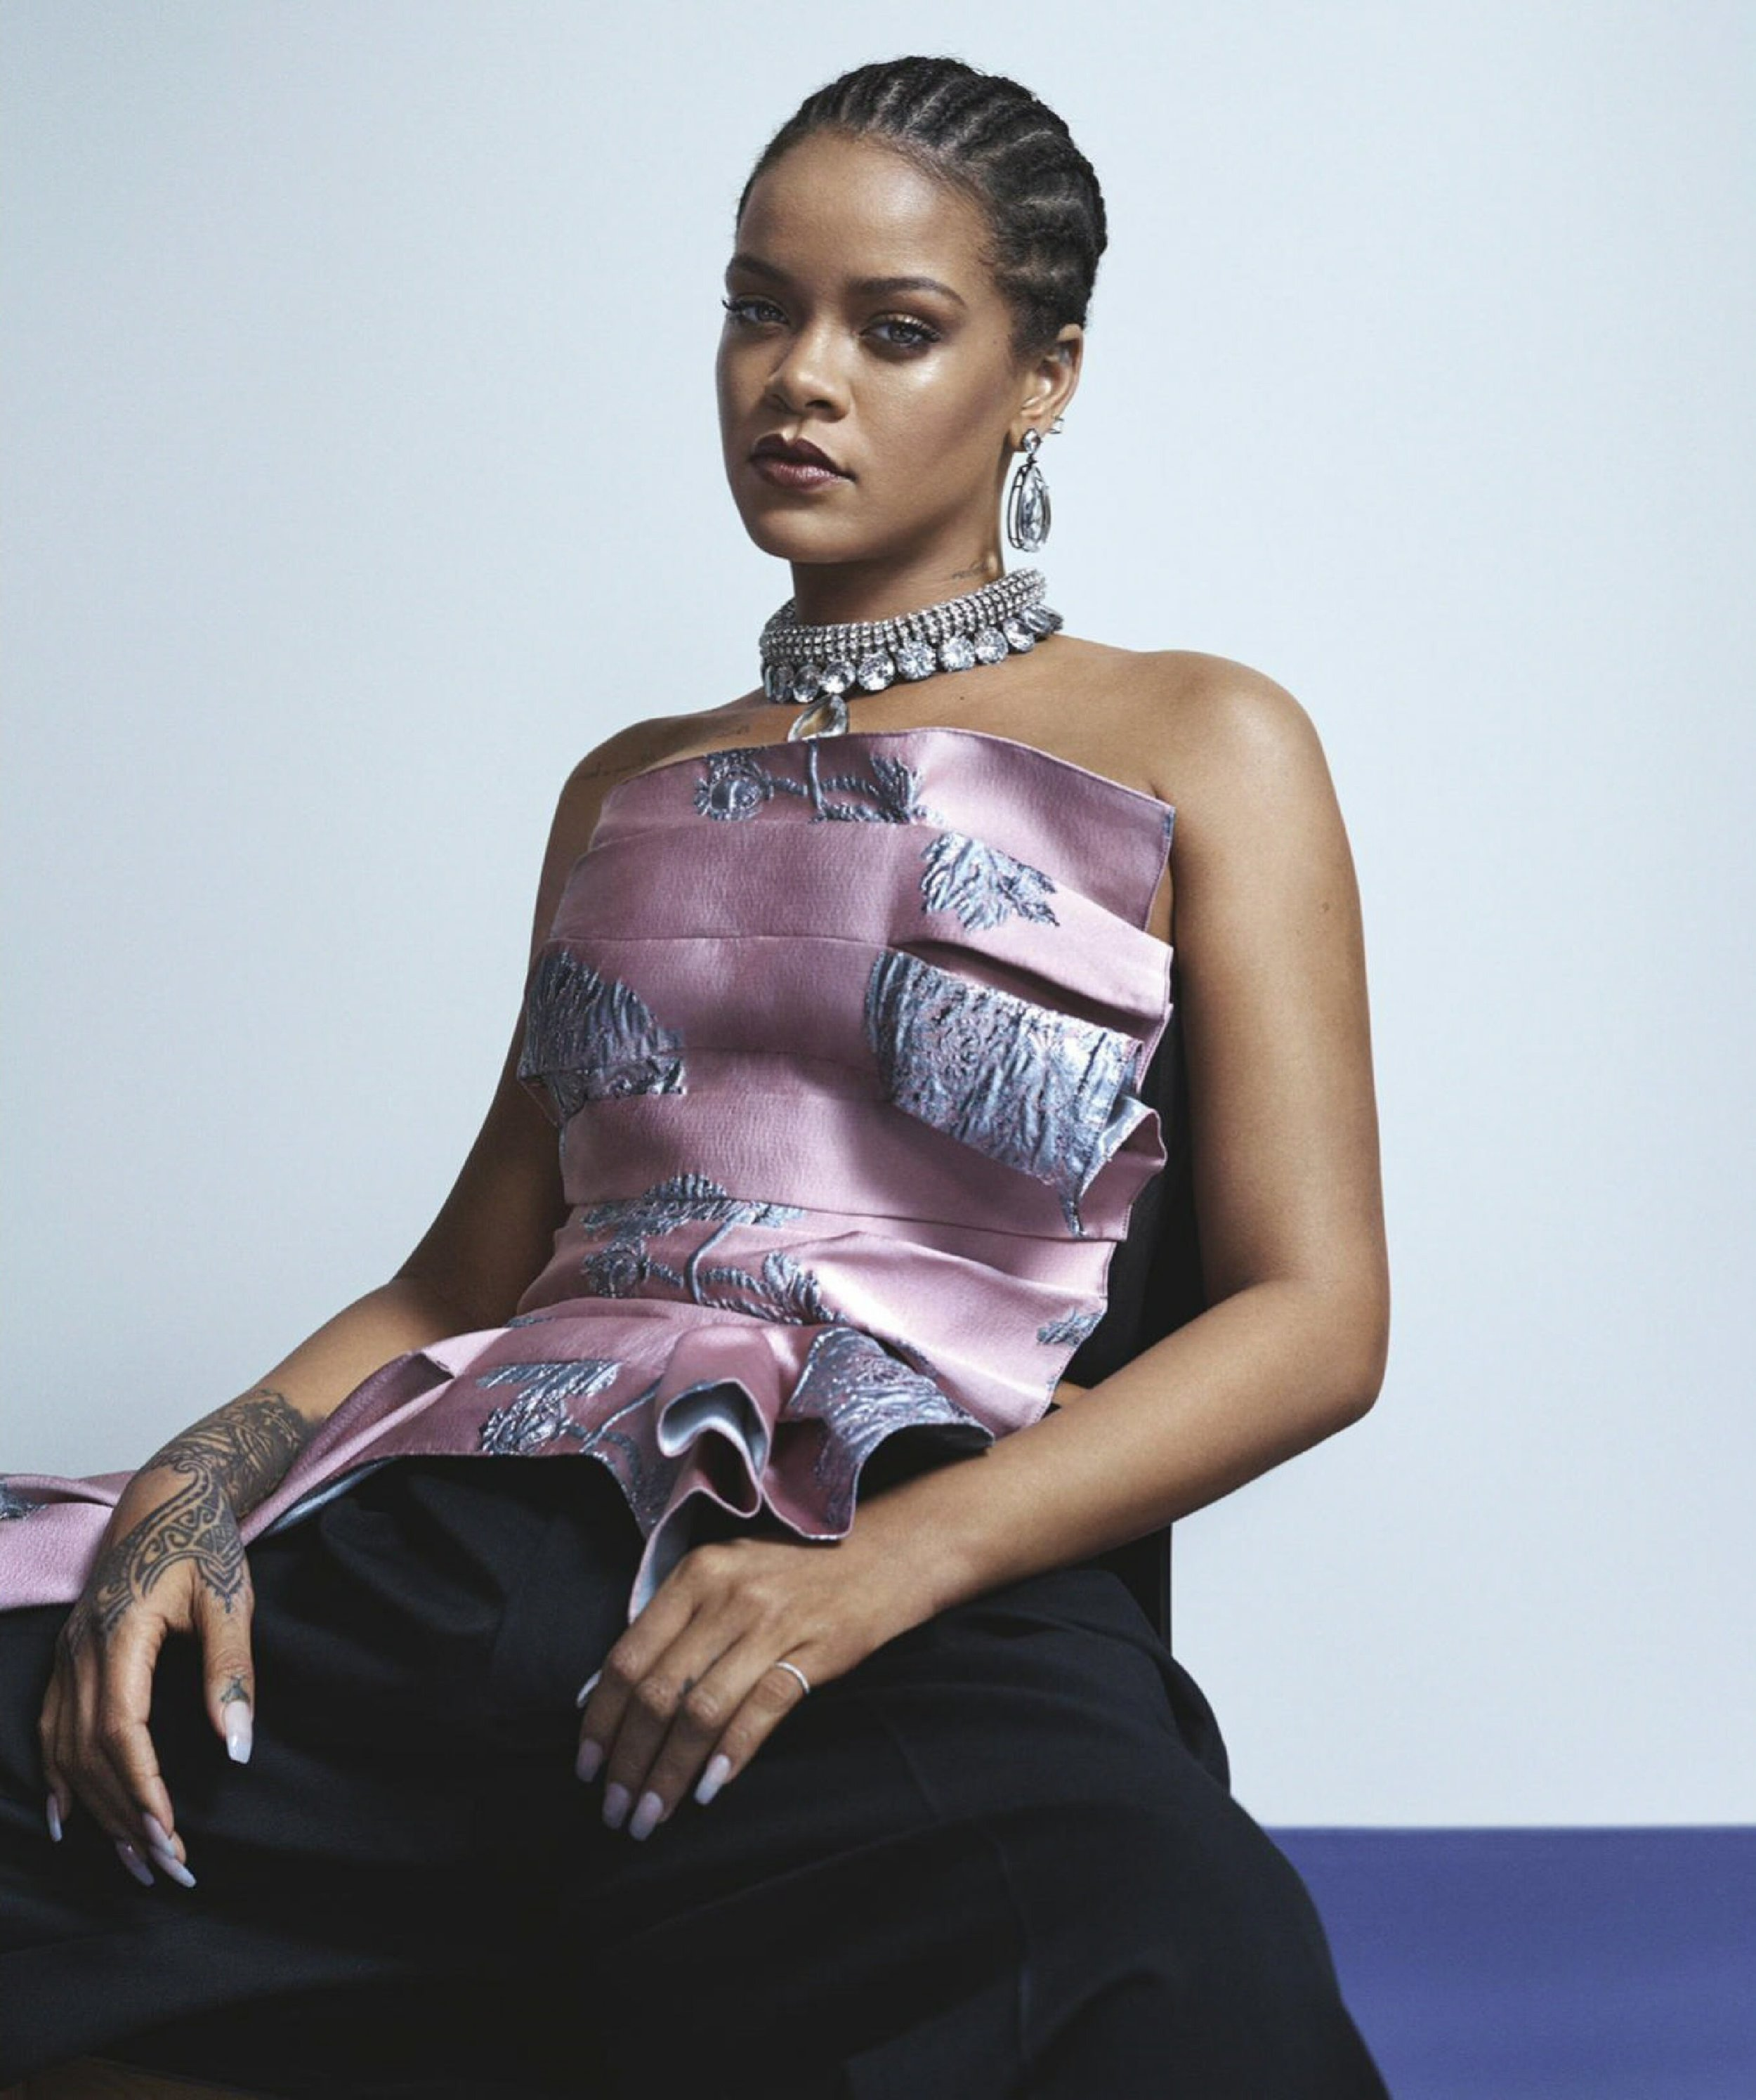 Rihanna-Josh-Olins-Vogue-Australia-May-2019- (6).jpg